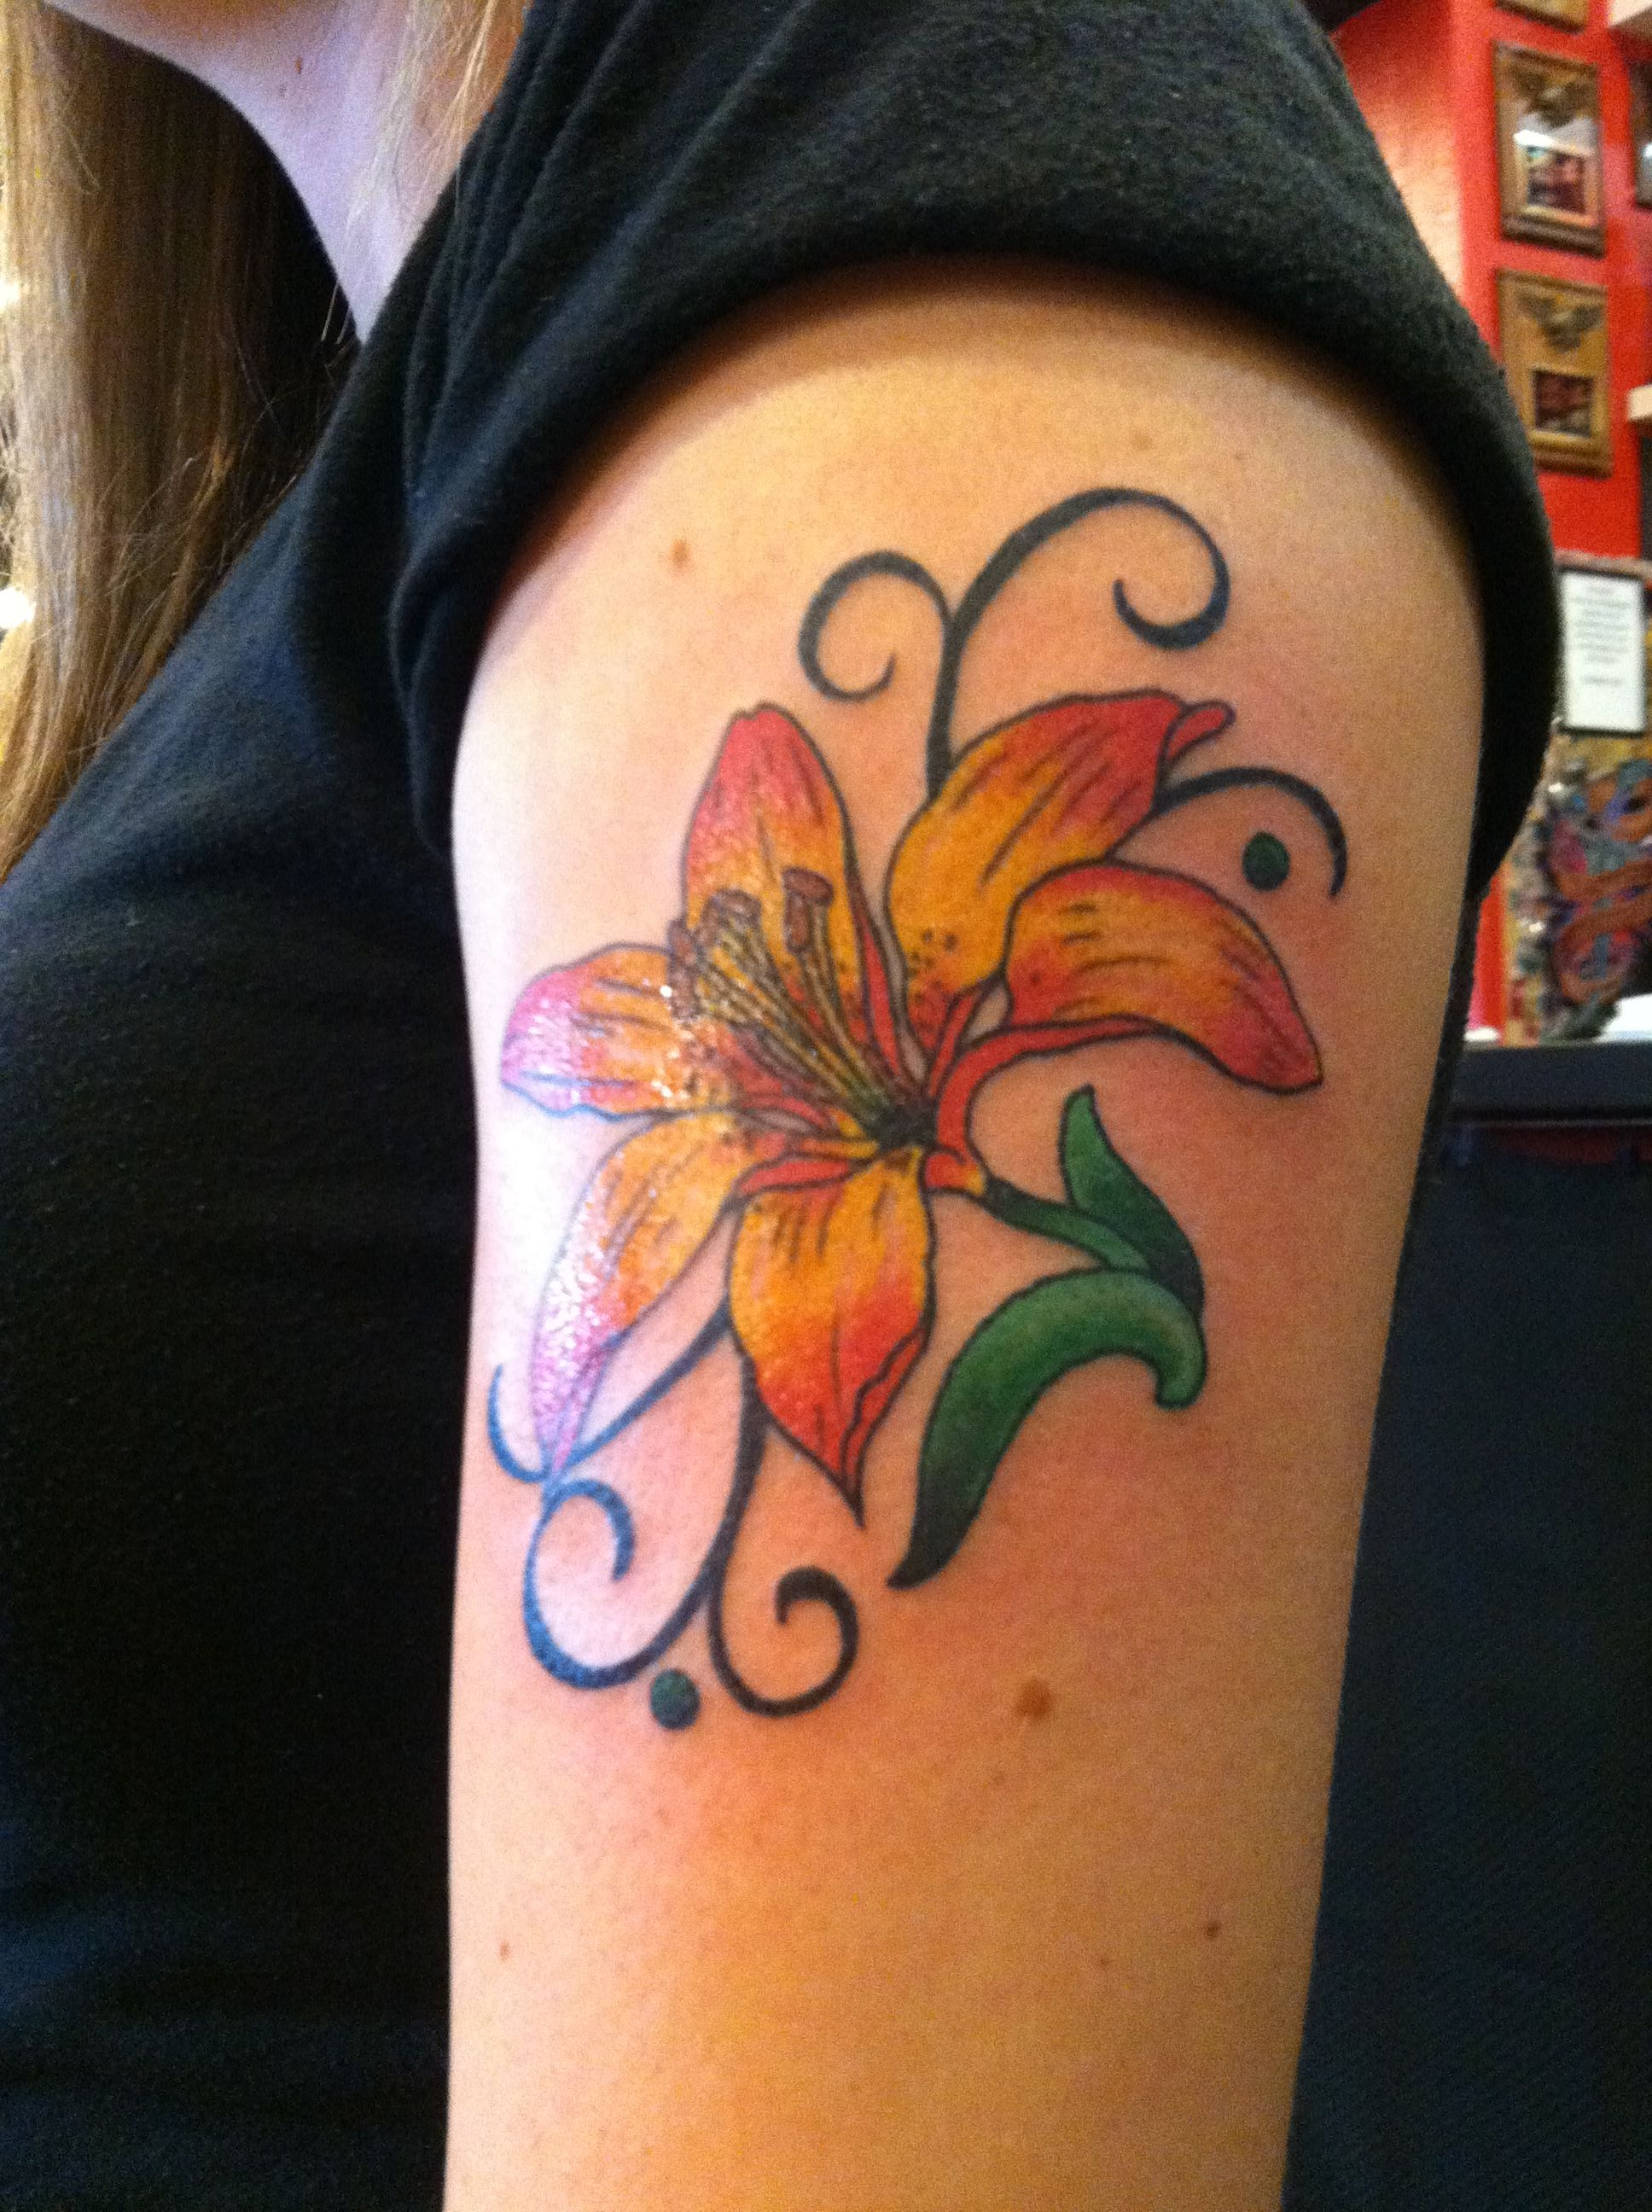 Pin on My Tattoos